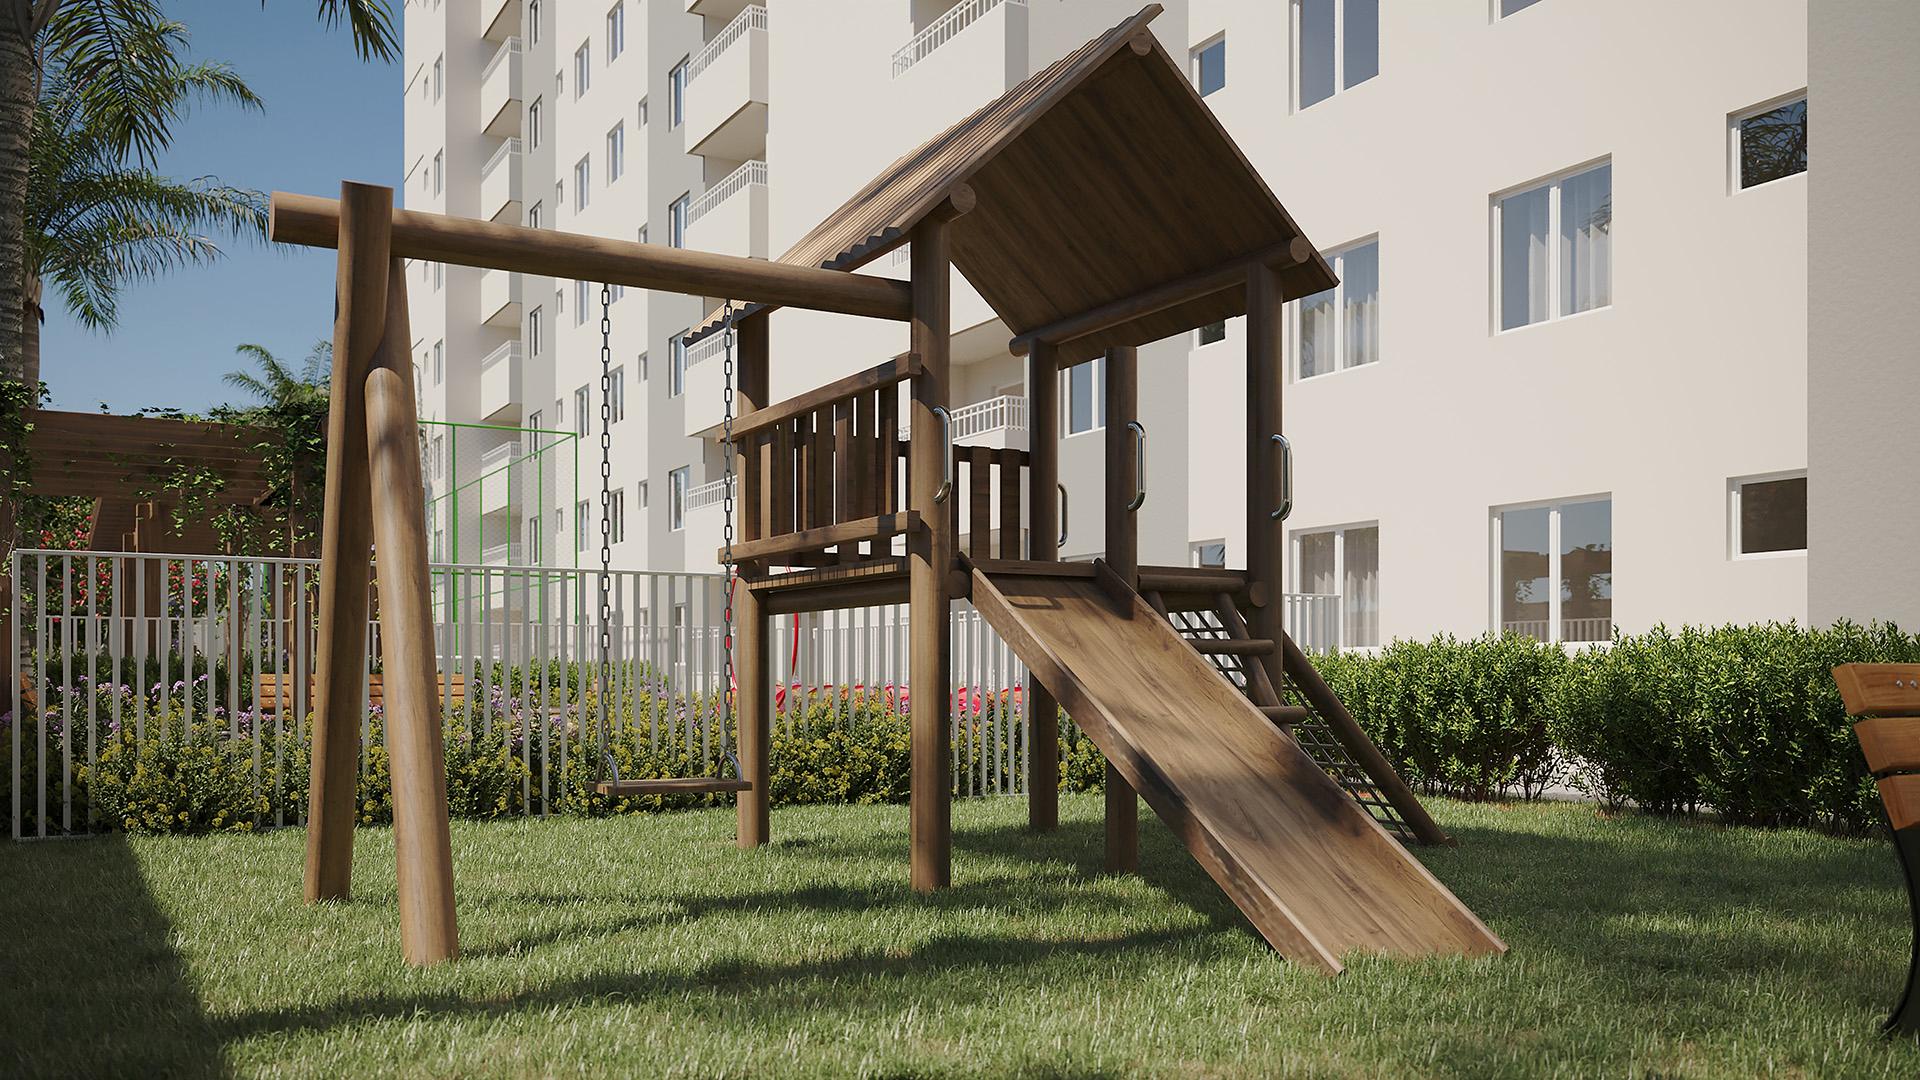 Playground - Park Leopoldino